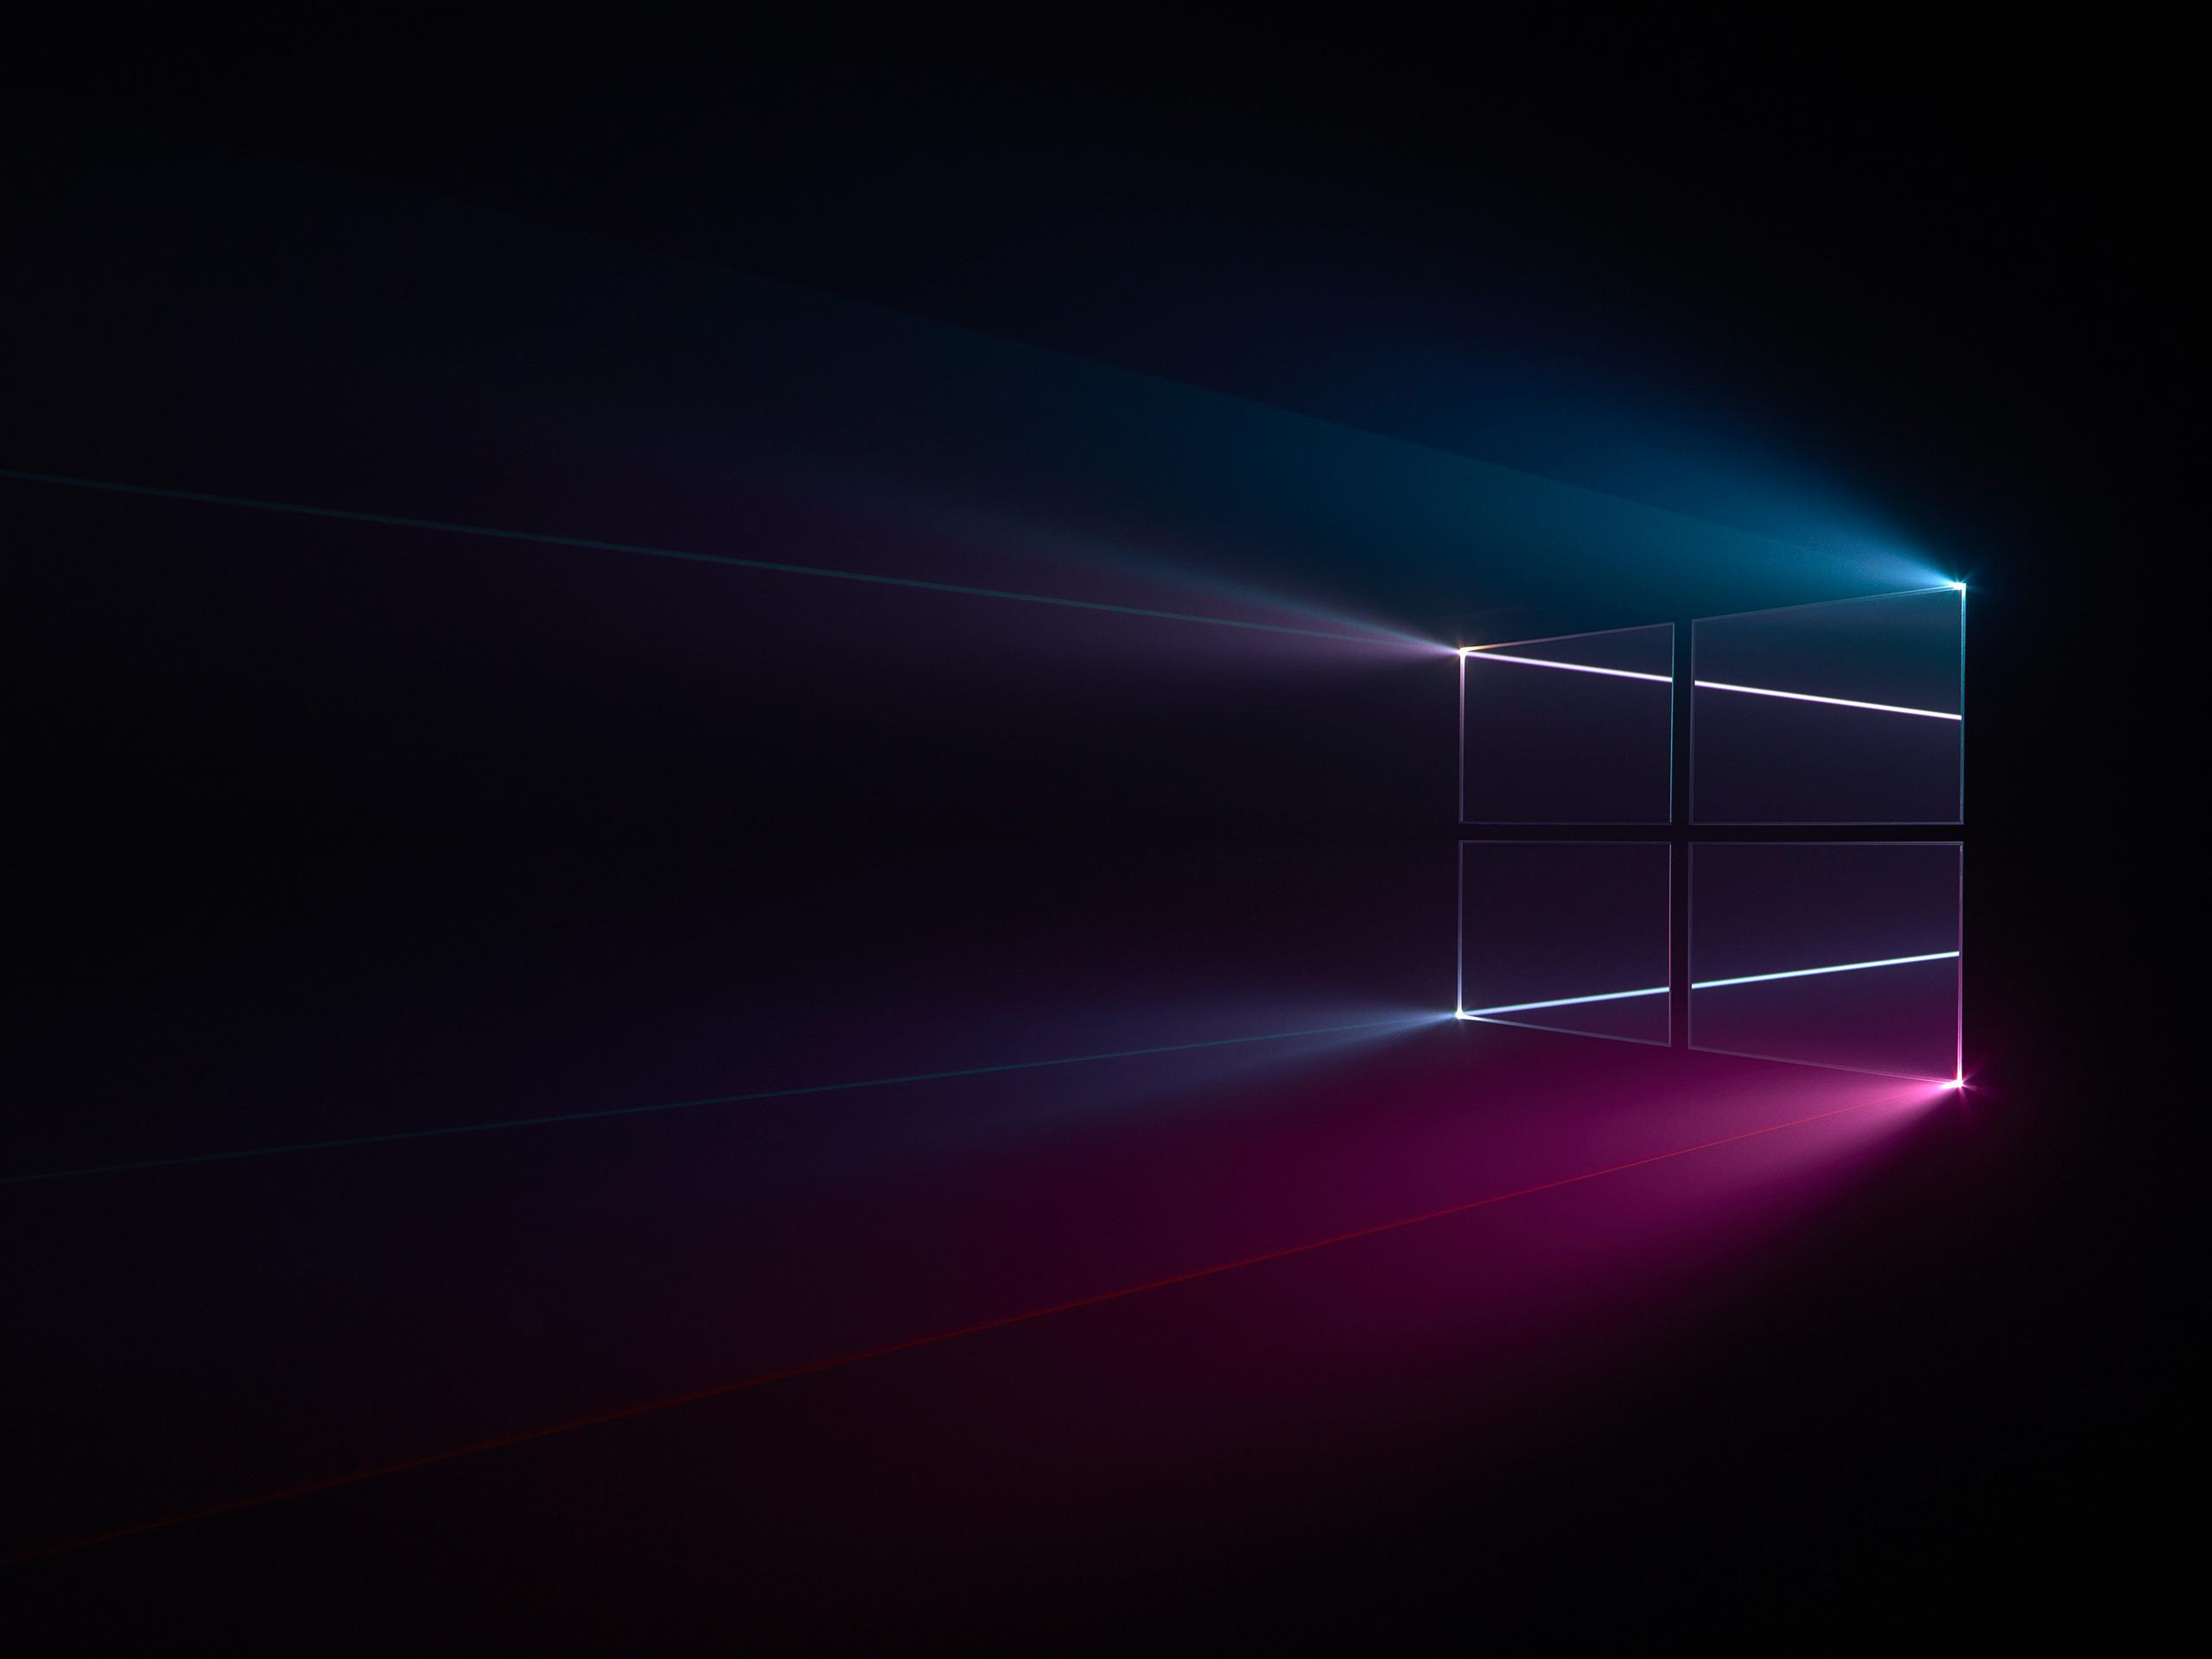 صور خلفيات اجمل خلفيات روعة خلفيات موبايل 2020 خلفيات للكمبيوتر HD 36